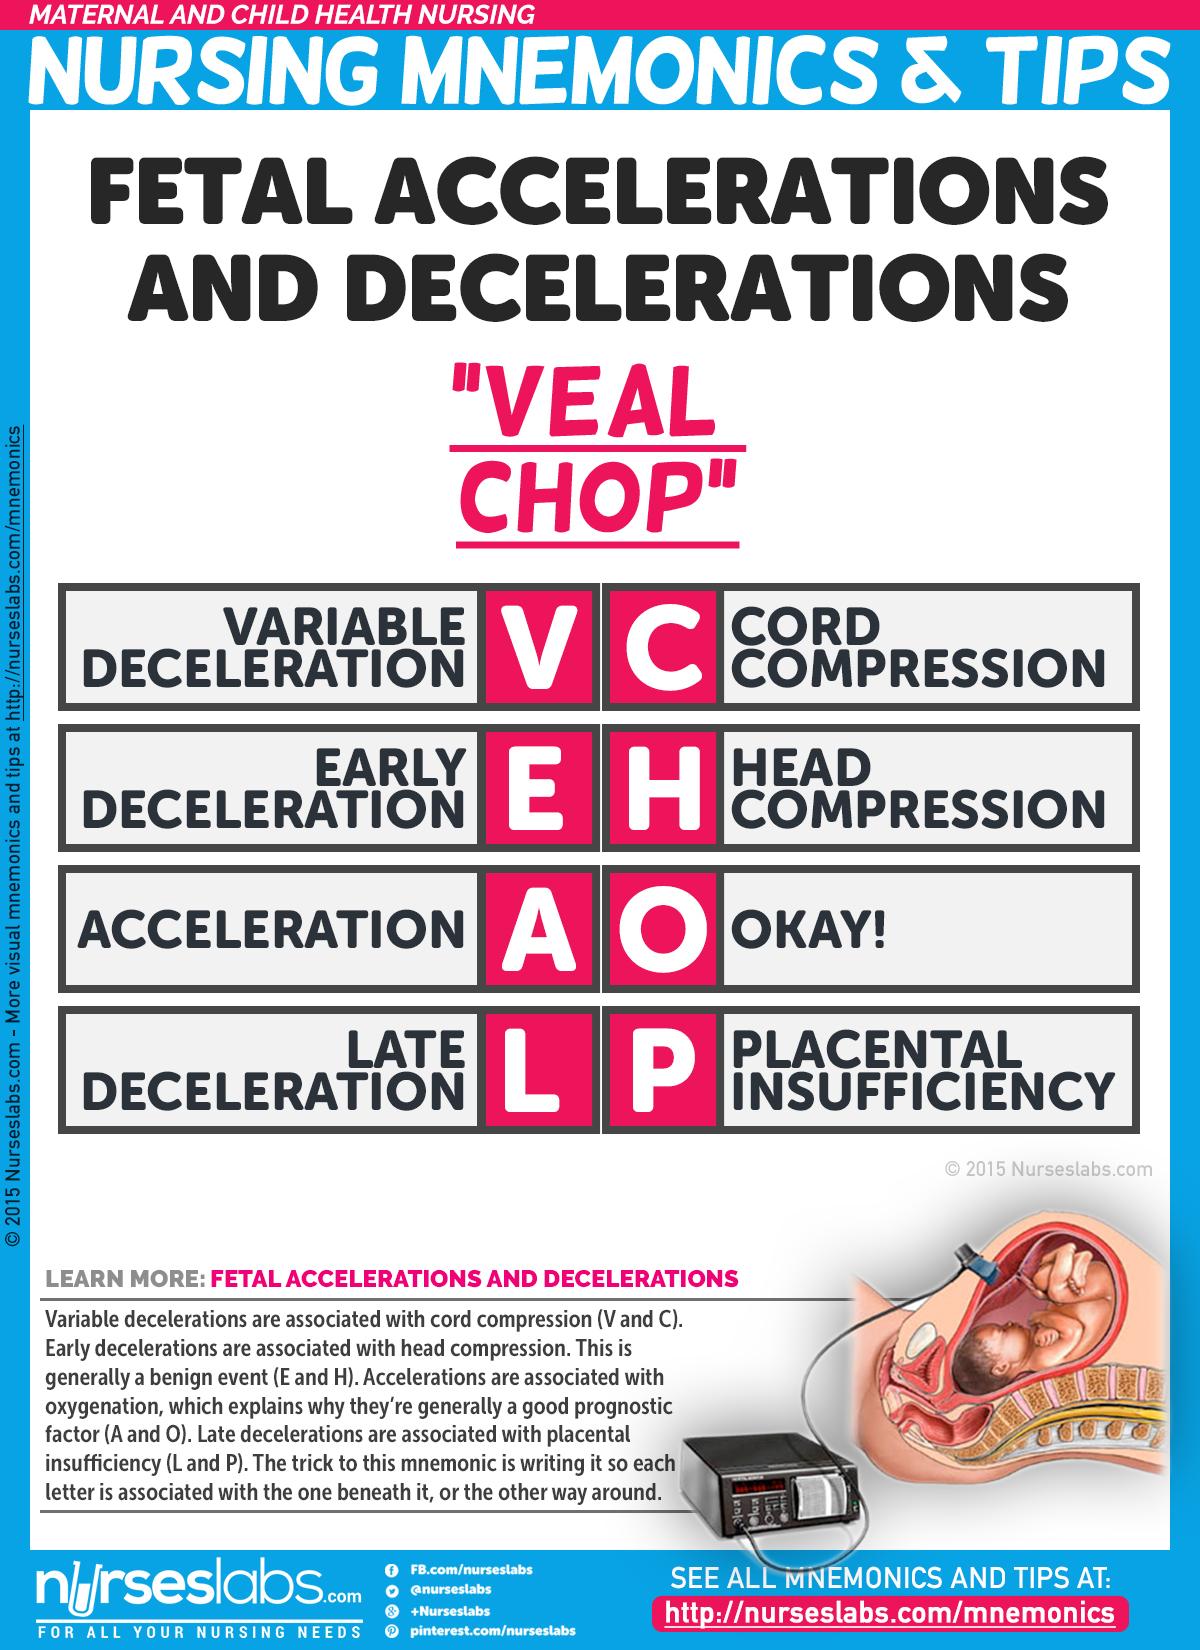 VEAL CHOP nursing mnemonic for Fetal Accelerations and Decelerations